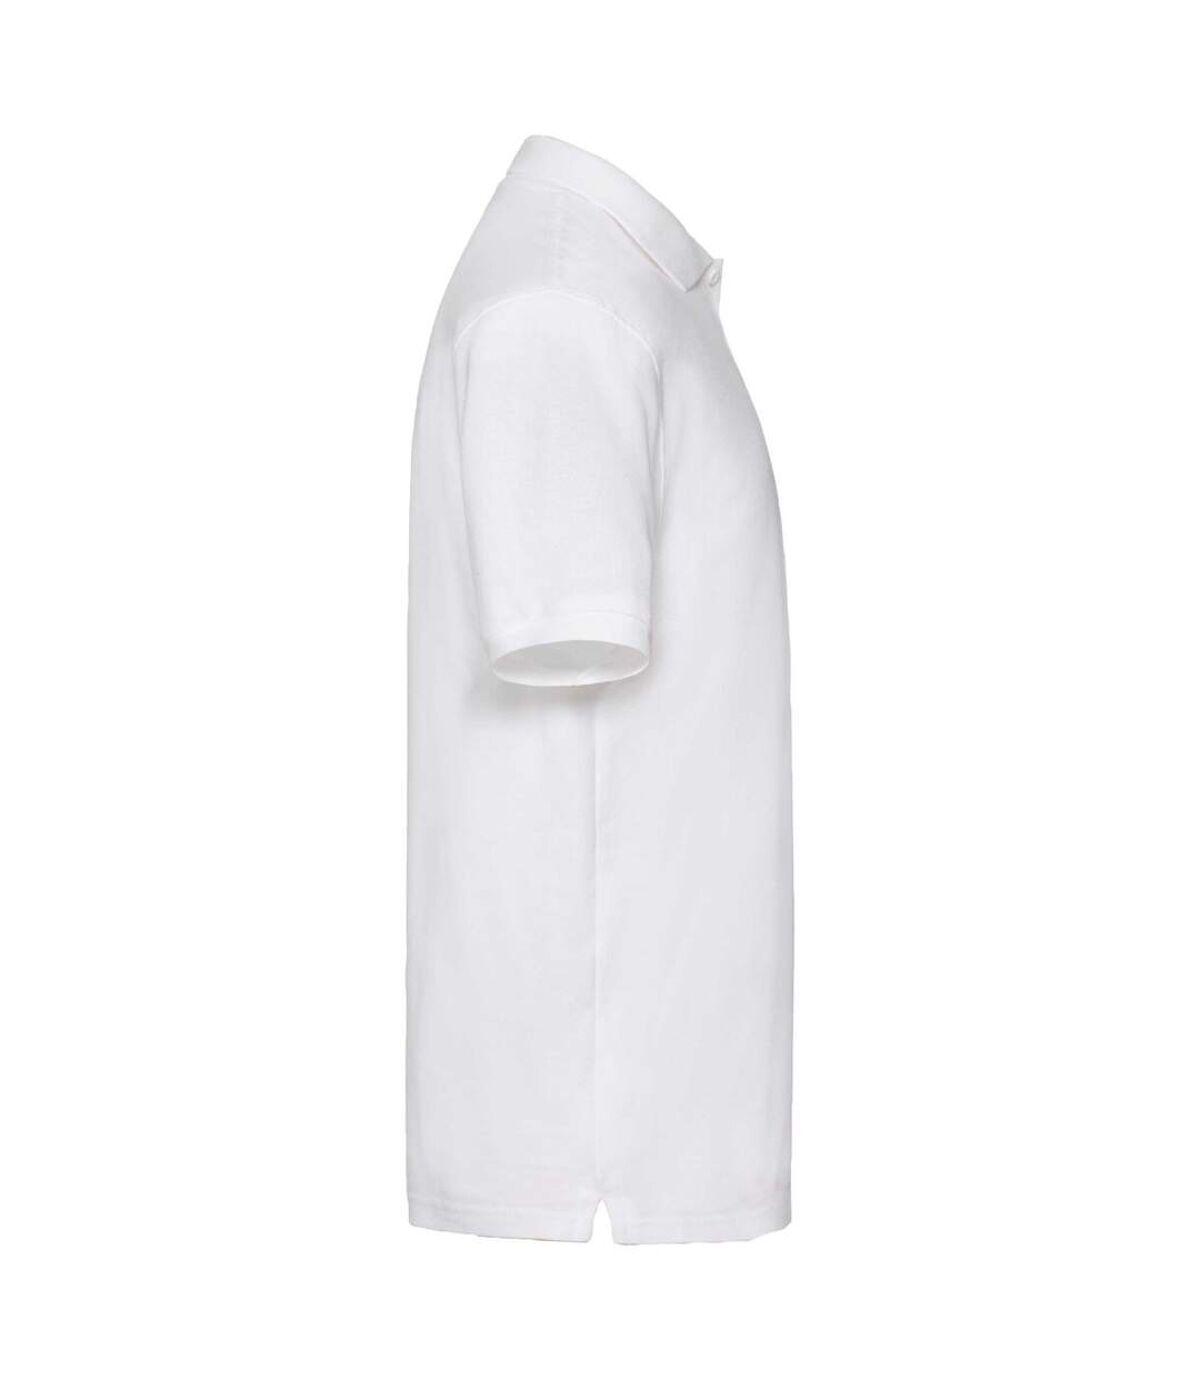 Fruit Of The Loom Premium Mens Short Sleeve Polo Shirt (White) - UTBC1381